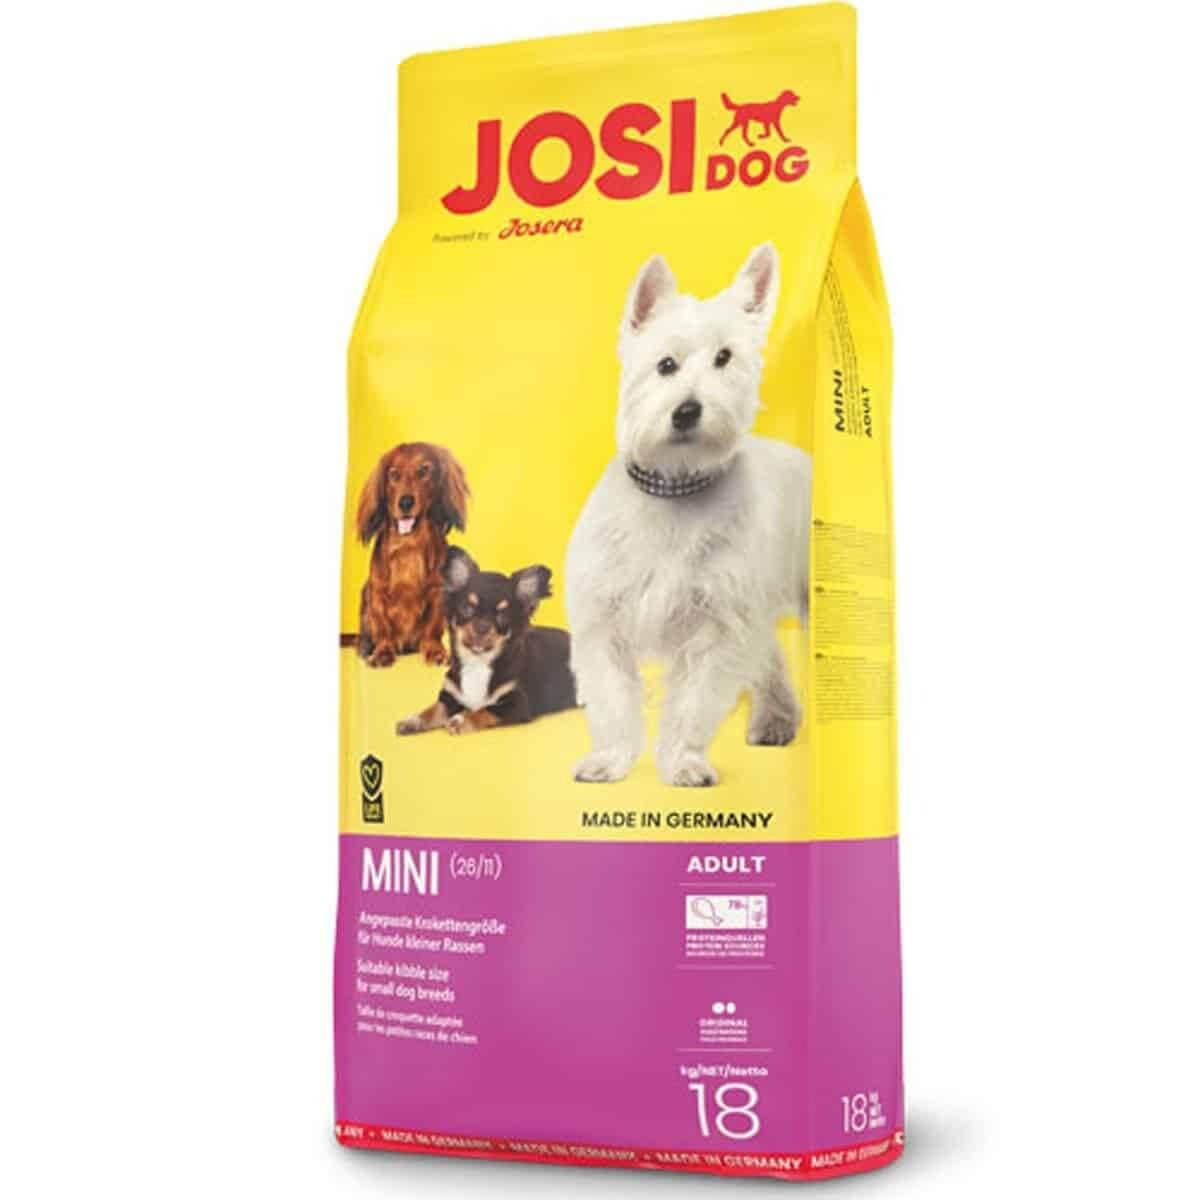 Buy Josera JosiDog Mini Small Breed Dog Food in Nairobi o Petsasa Pet store shop